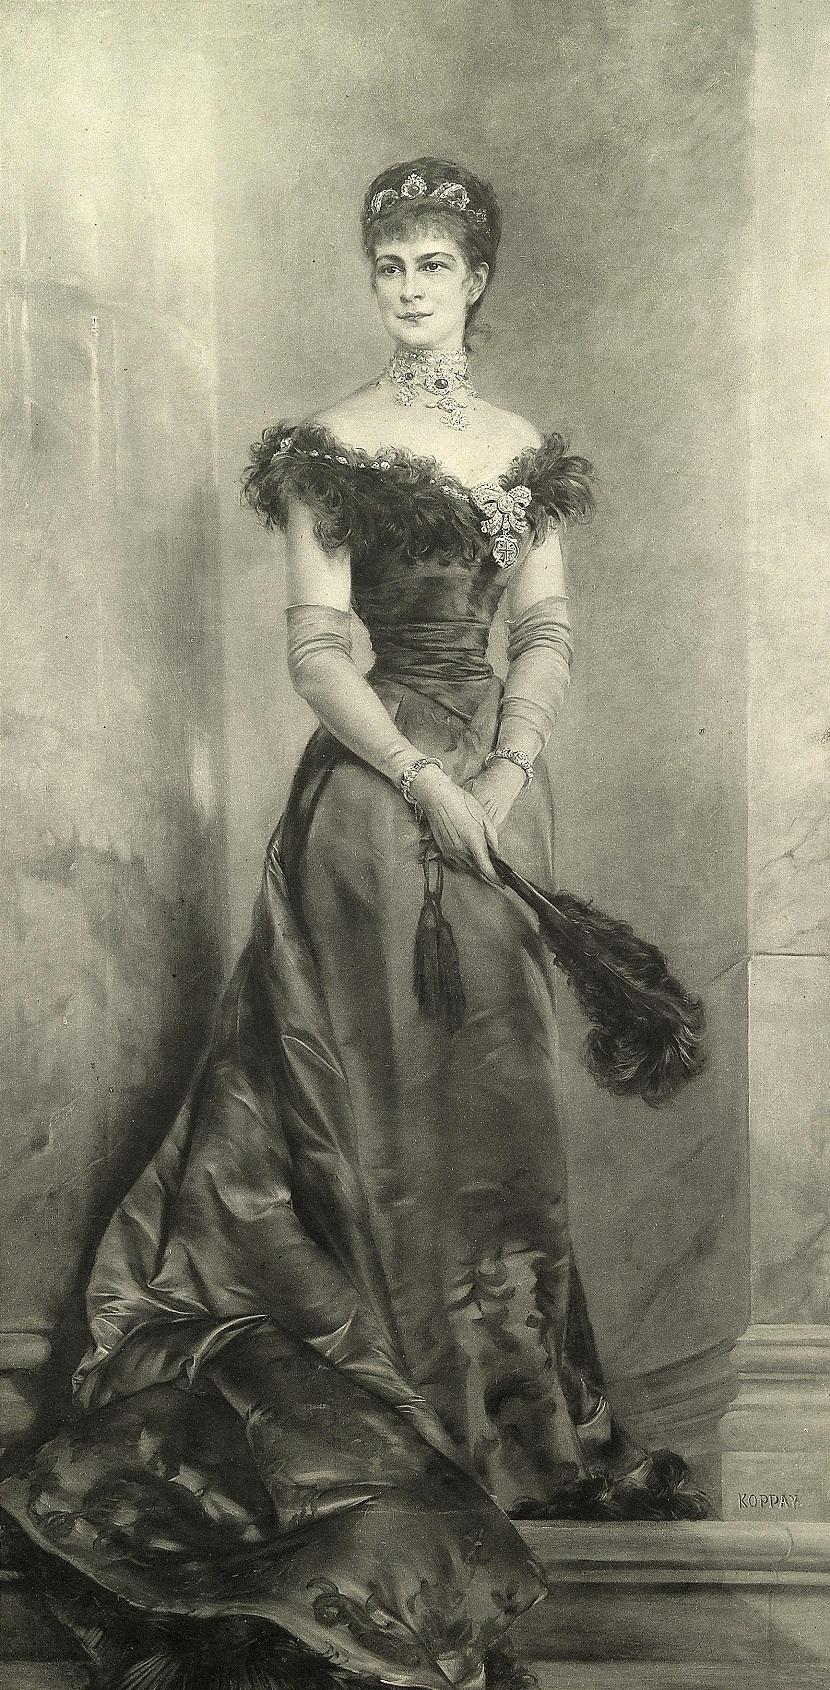 Josef Arpad Koppay (1859-1927) Kaiserin Elisabeth (Sissi)